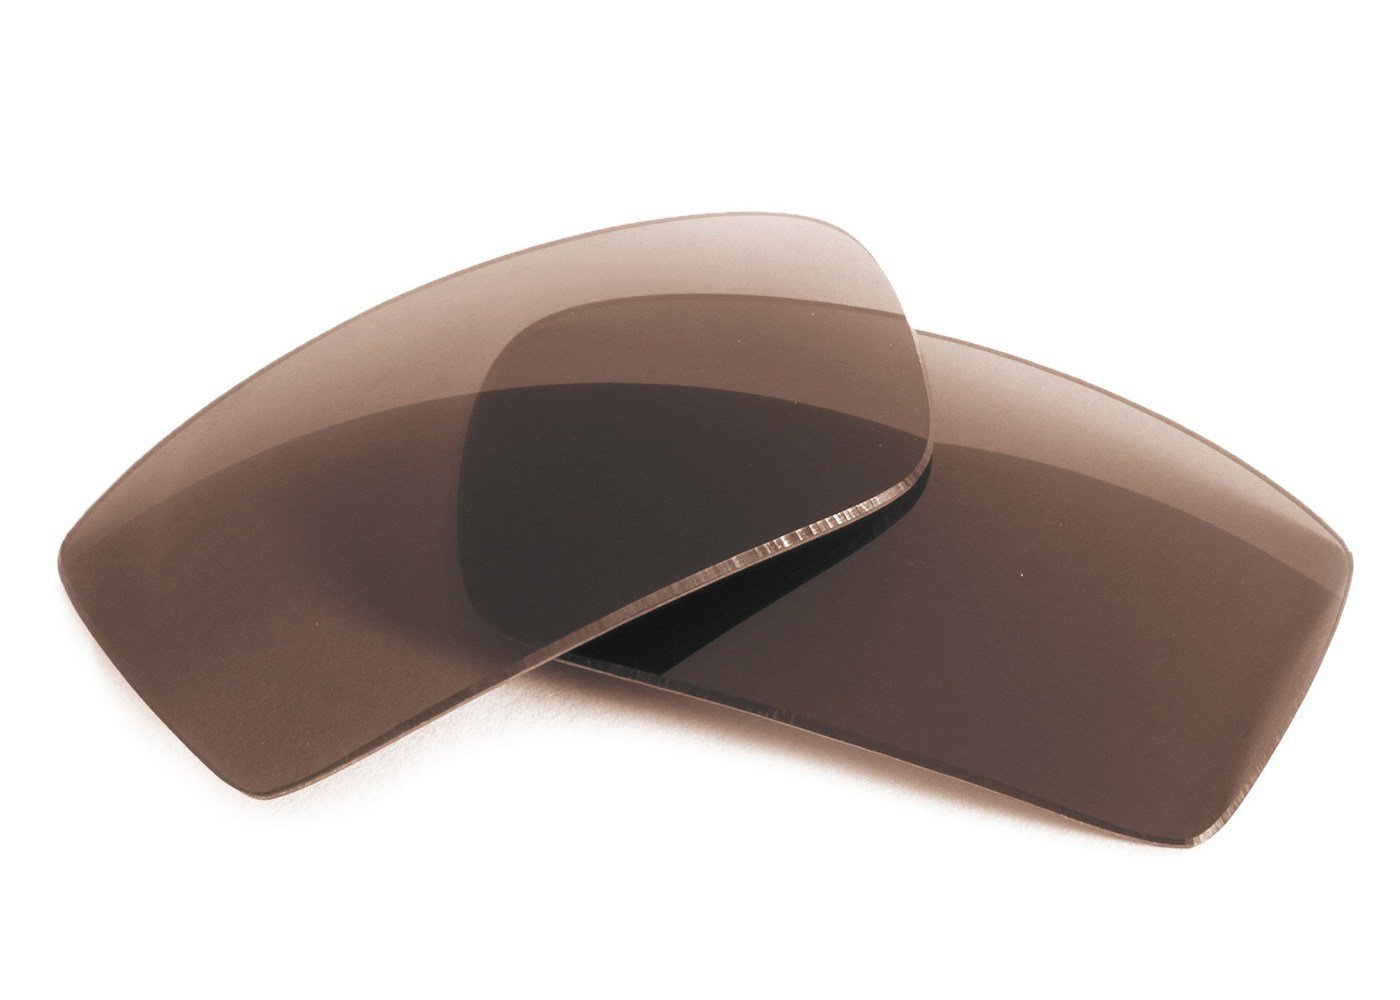 Fuse Lenses for Maui Jim Castaway MJ-187 - Brown Polarized